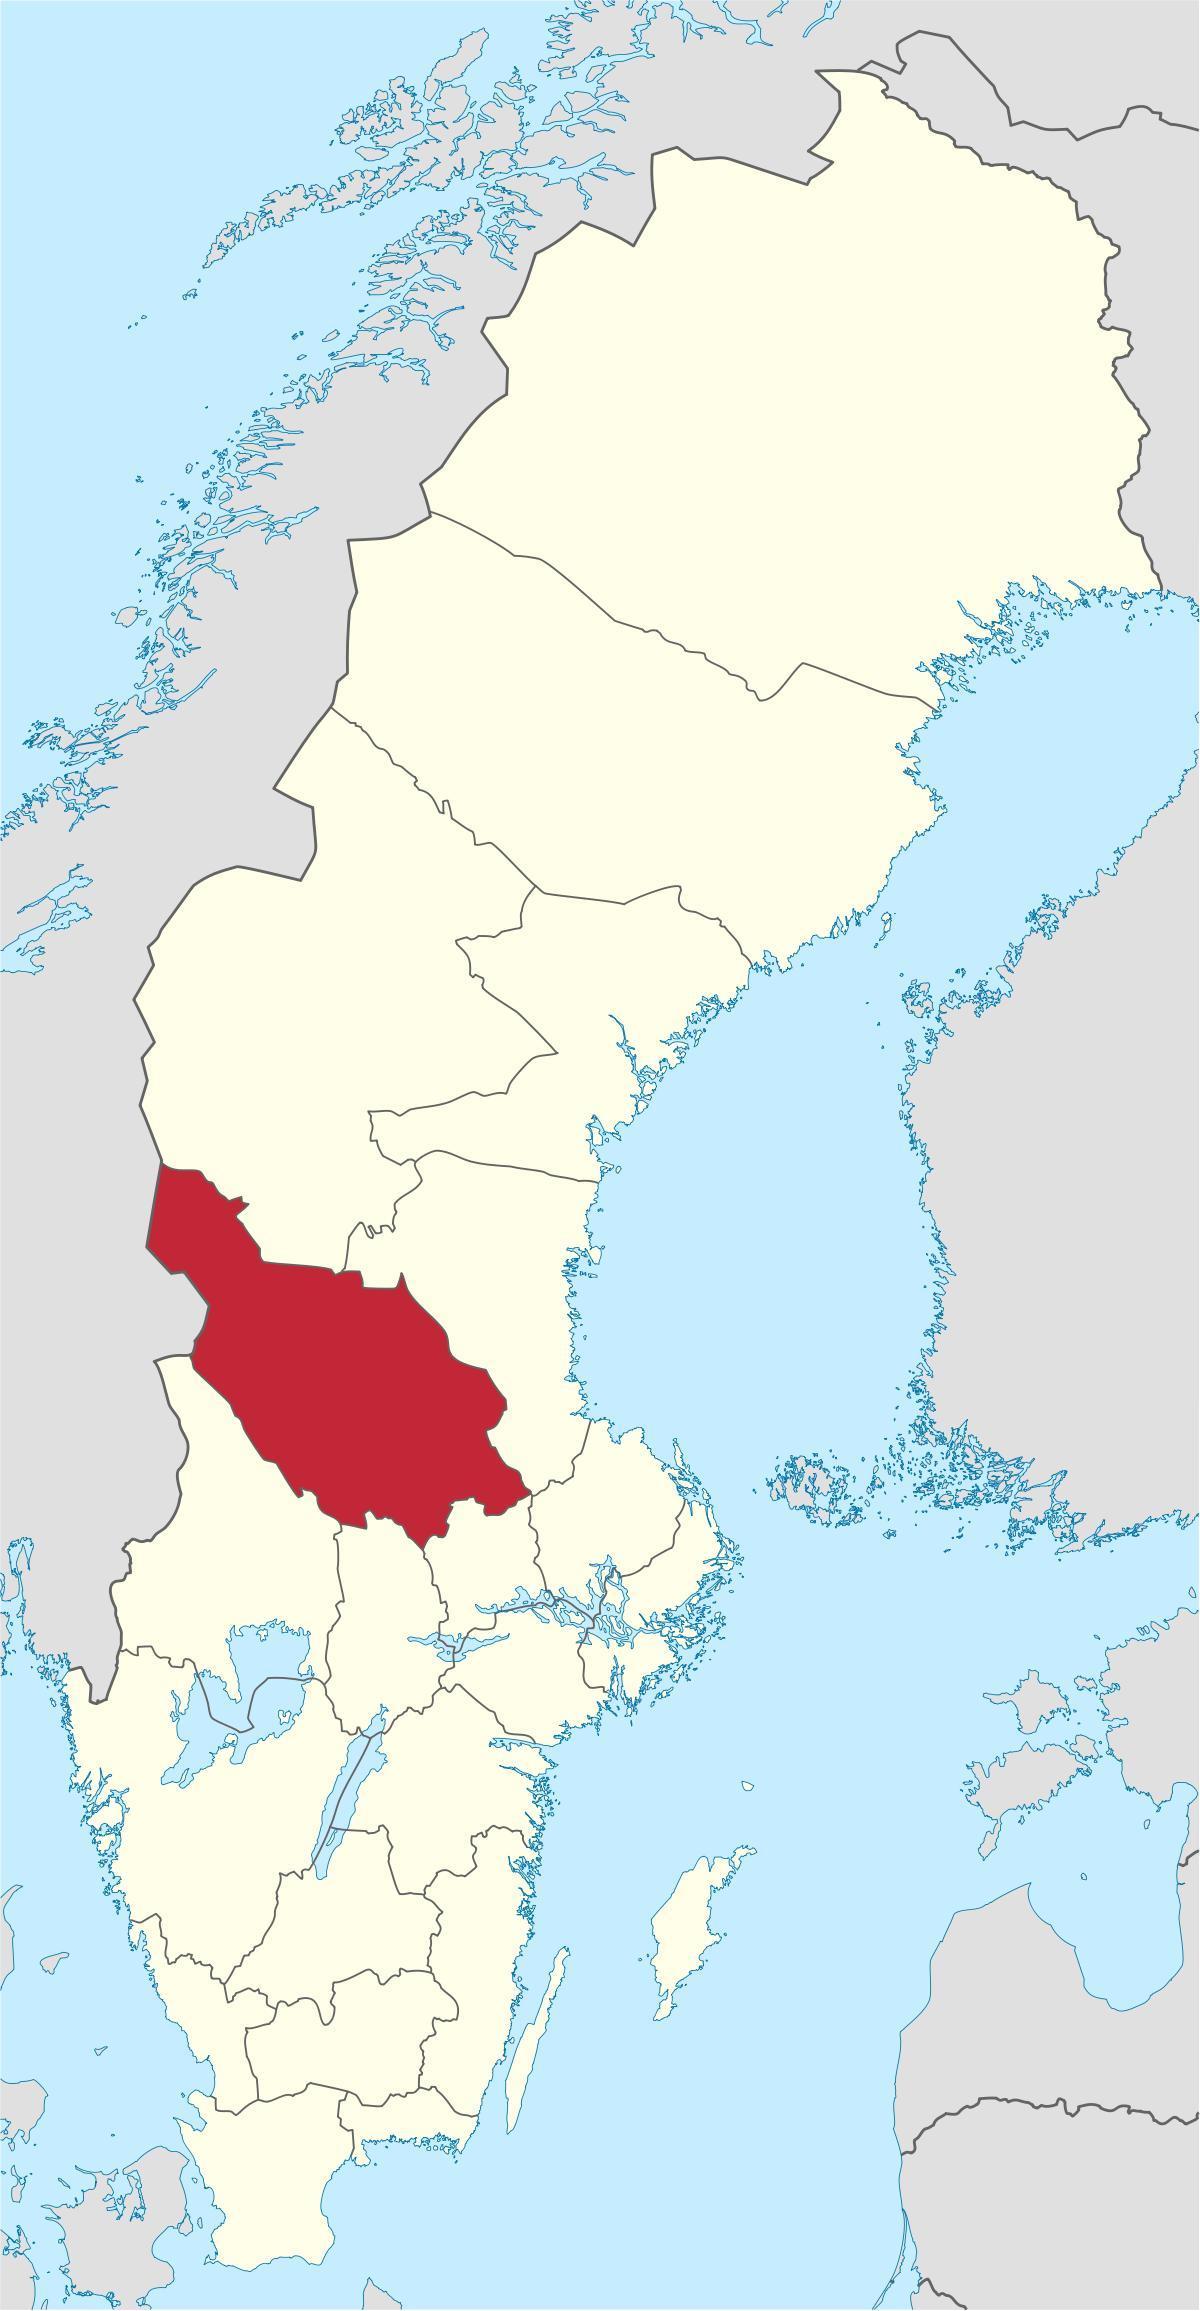 mora sverige kart Mora Sverige kart   Kart over Mora i Sverige (Nord Europa   Europa) mora sverige kart